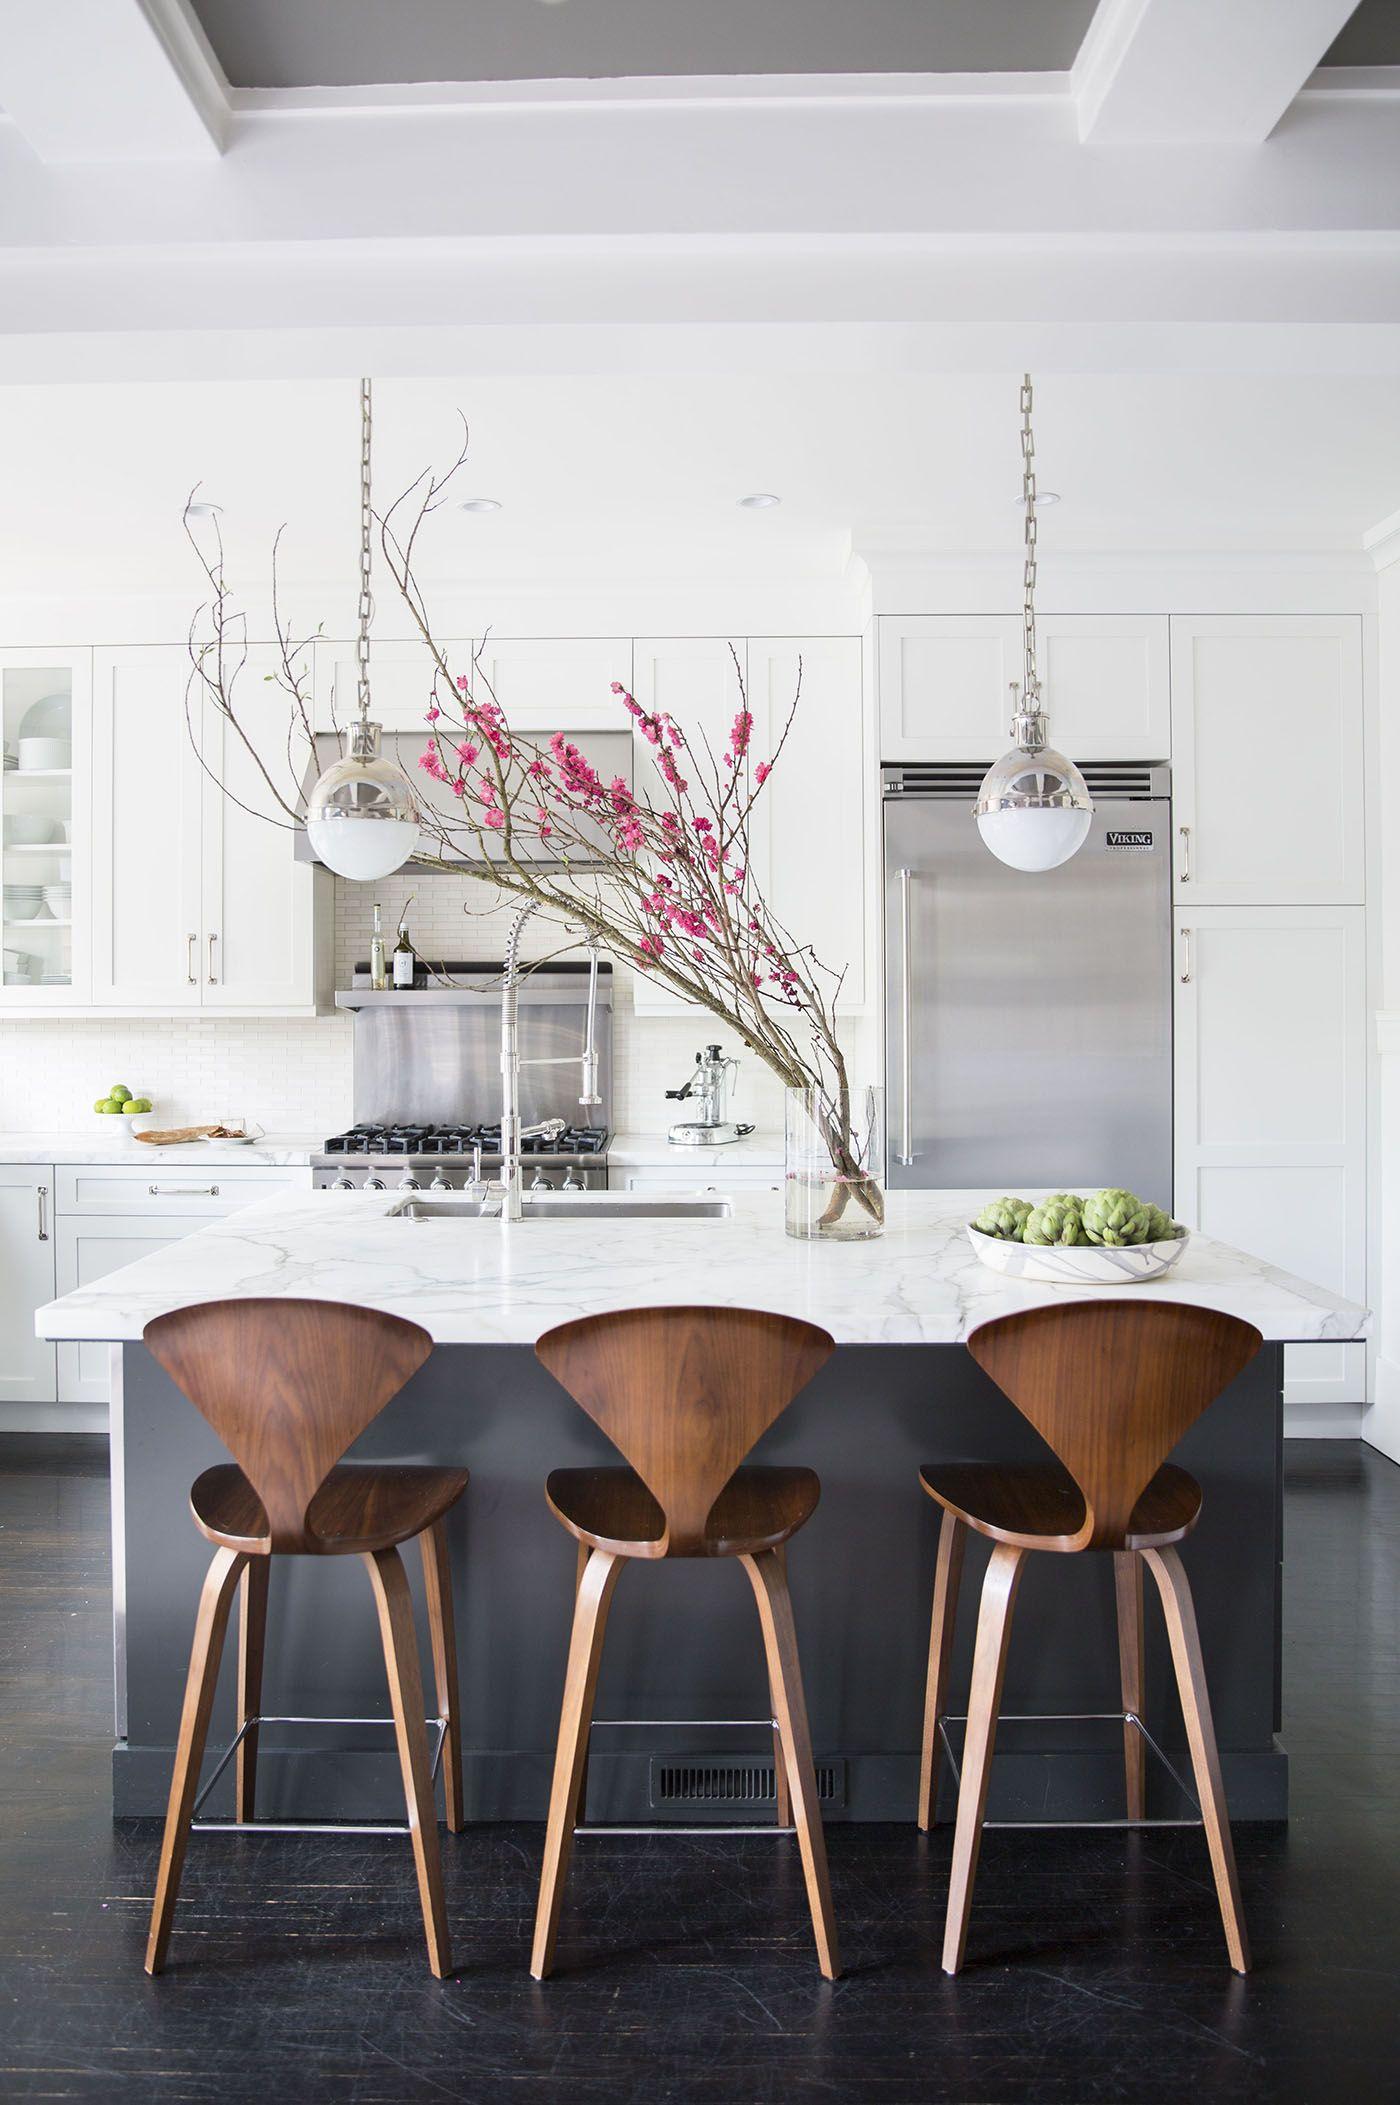 Contemporary Kitchen Interior Design: Client Spotlight: Grant K. Gibson Interior Design